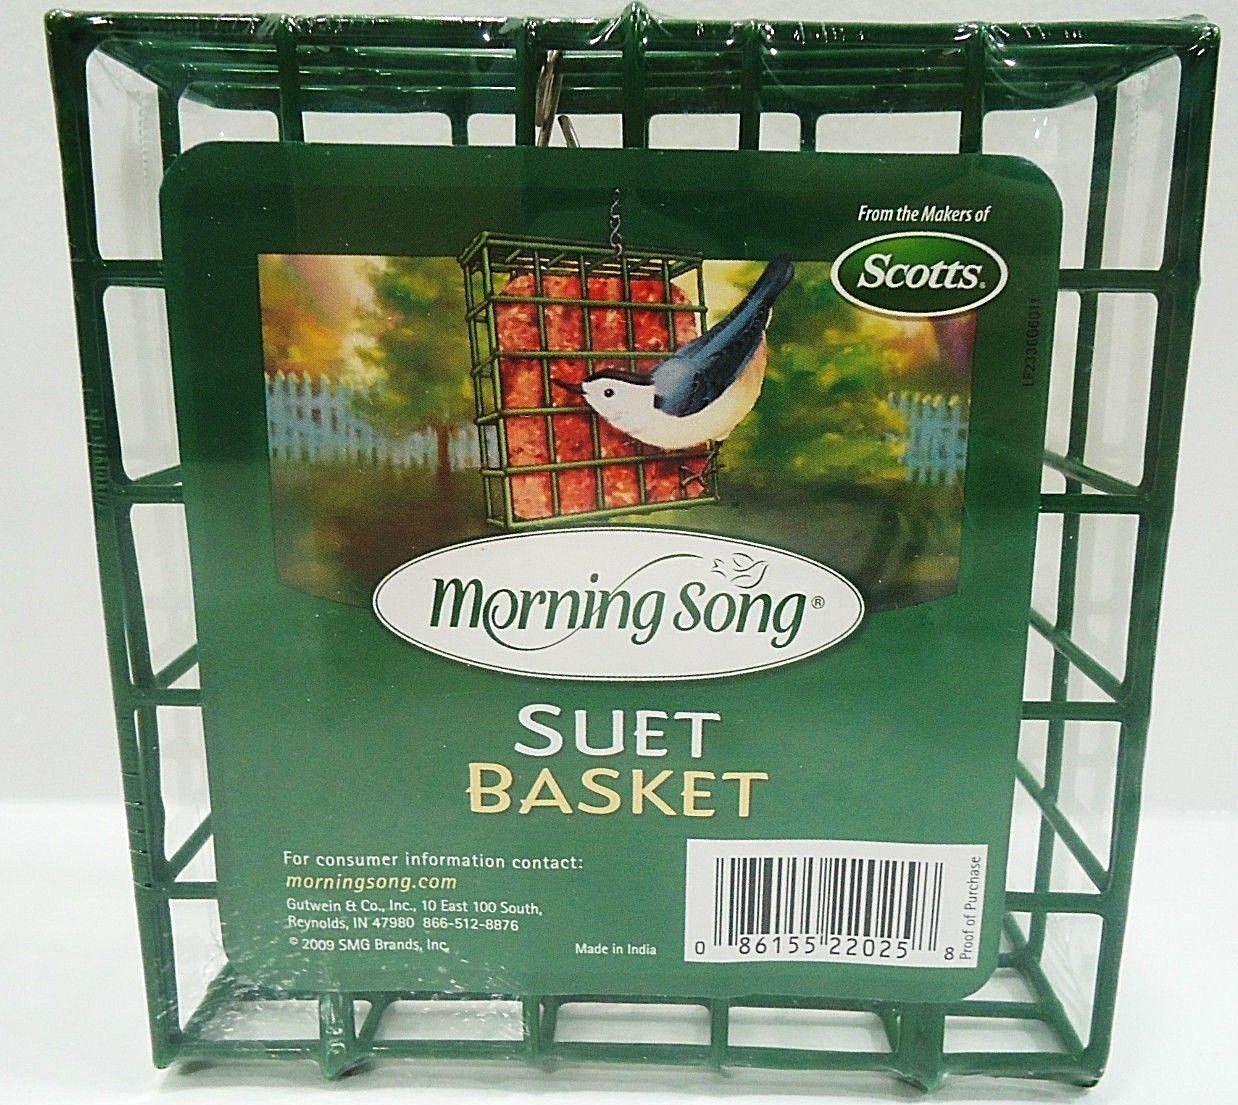 SCOTTS - OUTDOOR - MORNING SONG - SUET - BASKET - BIRD - FEEDER - HOUSE - NEW - $6.29